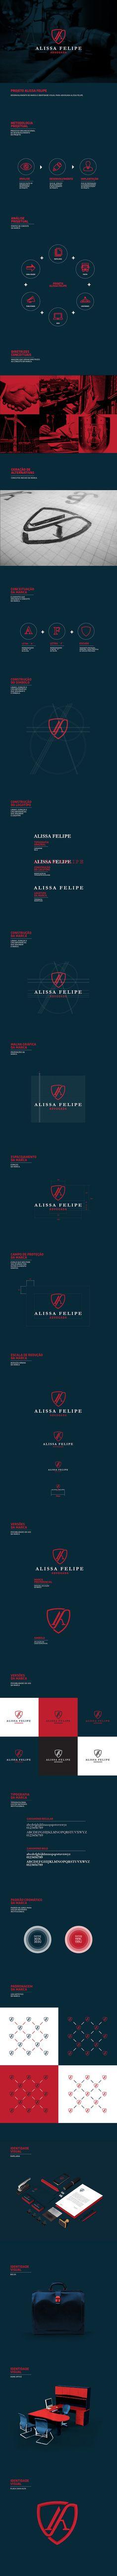 ALISSA FELIPE on Behance